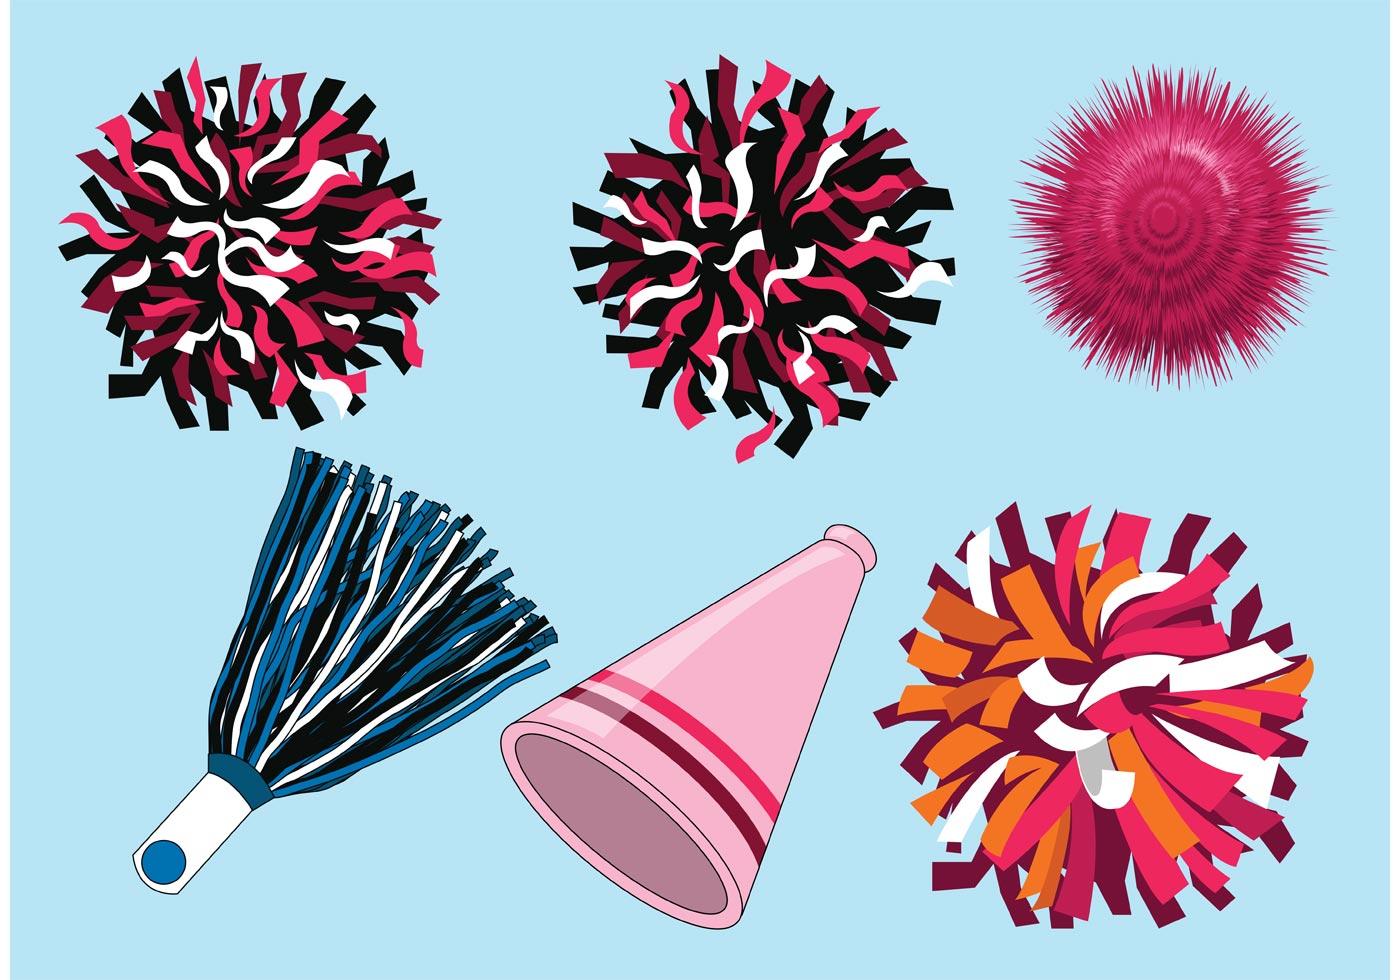 pom poms vectors download free vector art  stock graphics   images pom pom clip art silhouette pom poms clip art printable